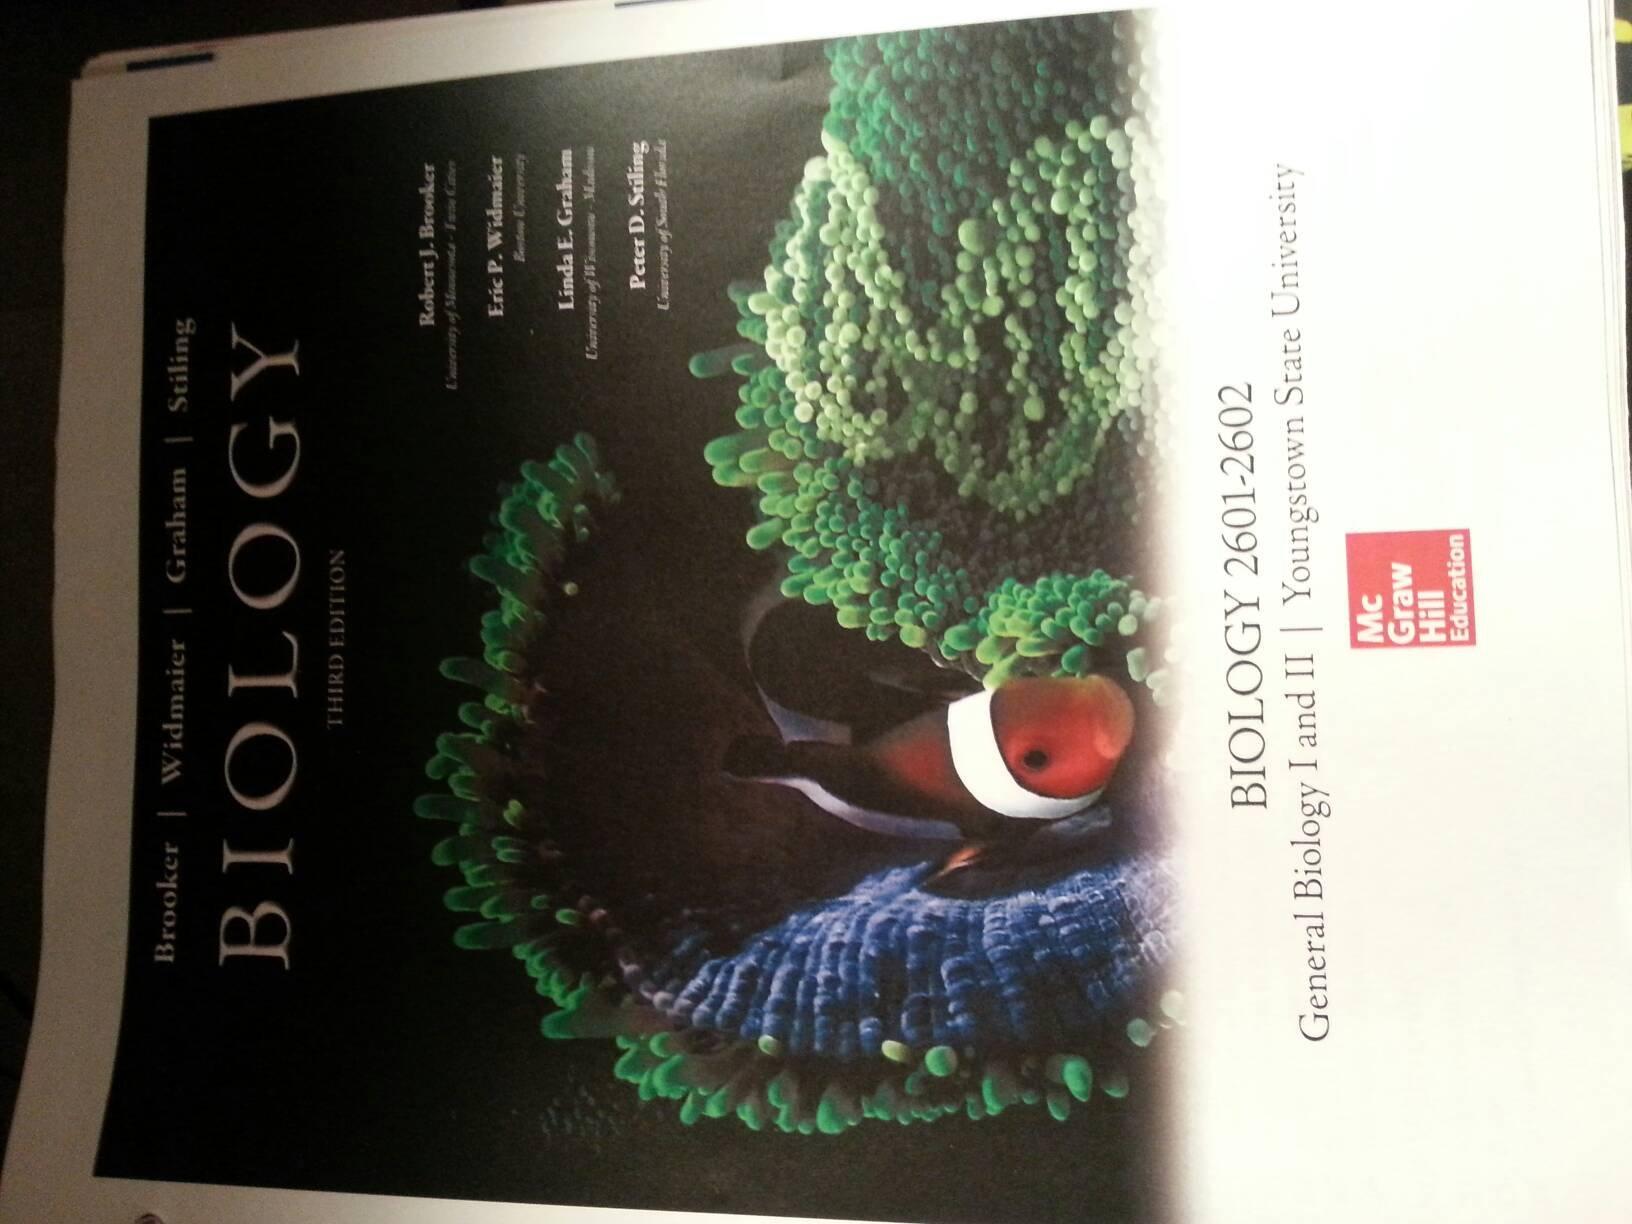 BIOLOGY BROOKER 3RD EDITION PDF